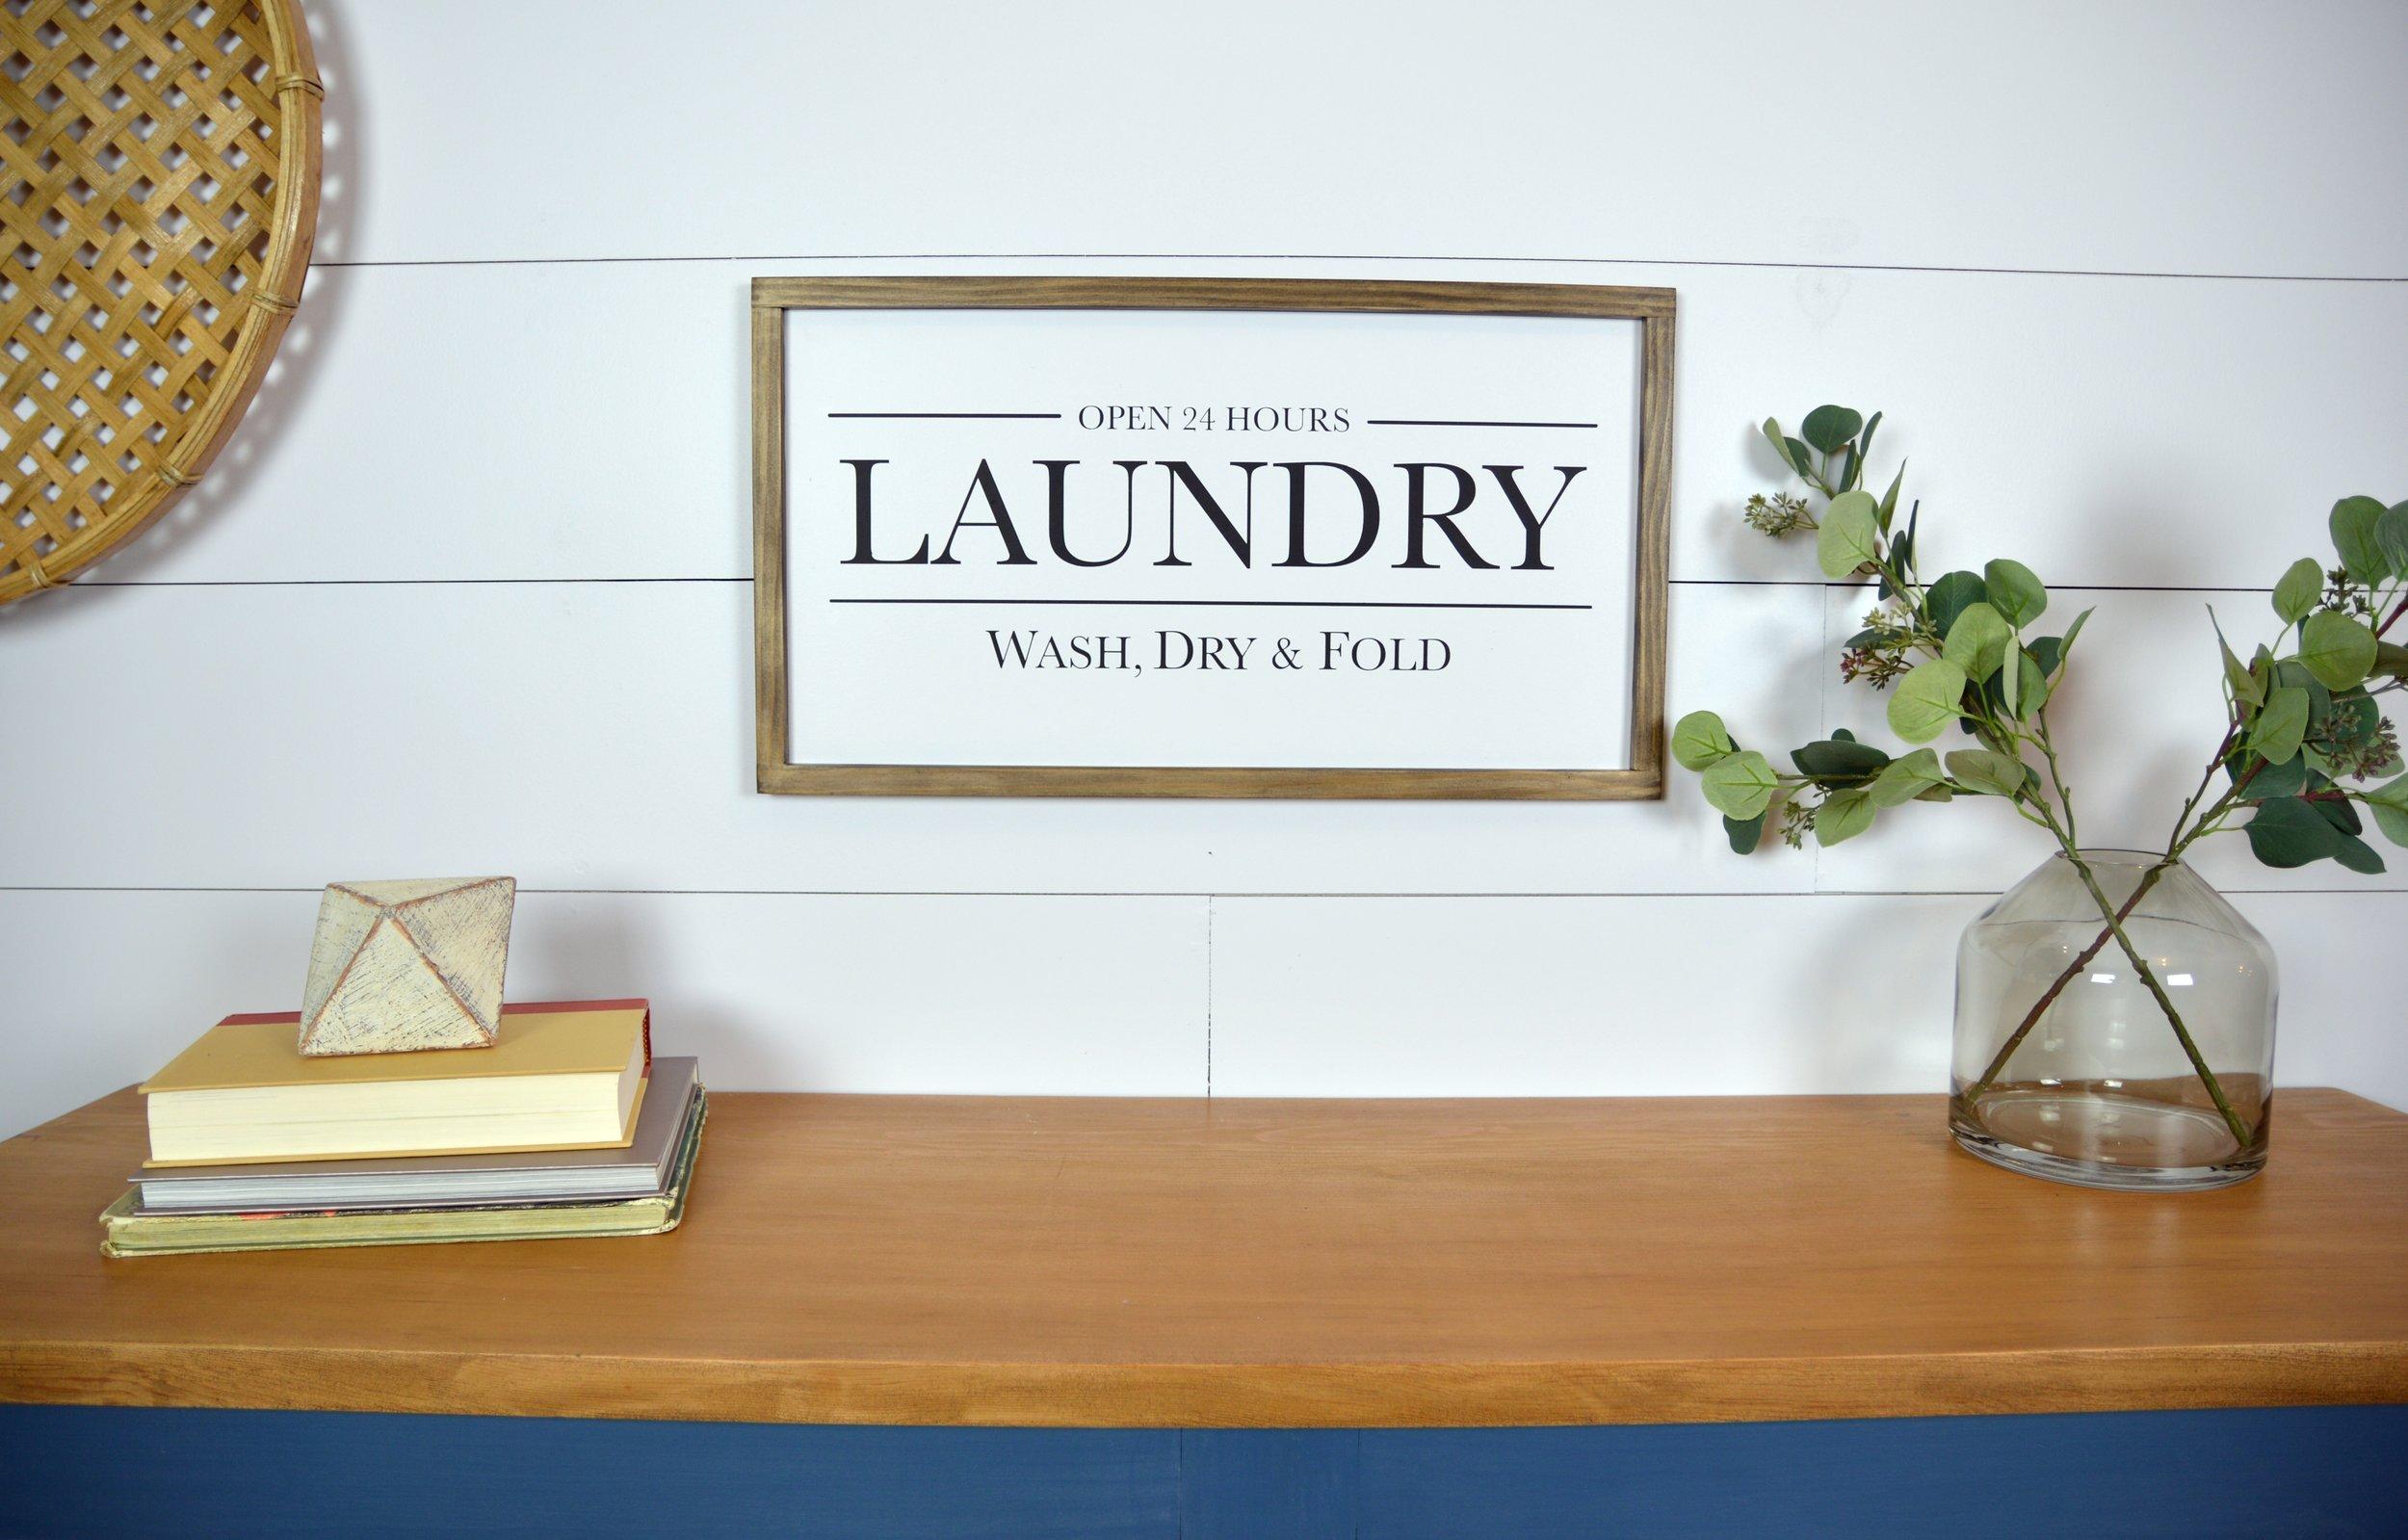 Laundry wash dry fold 2.jpg